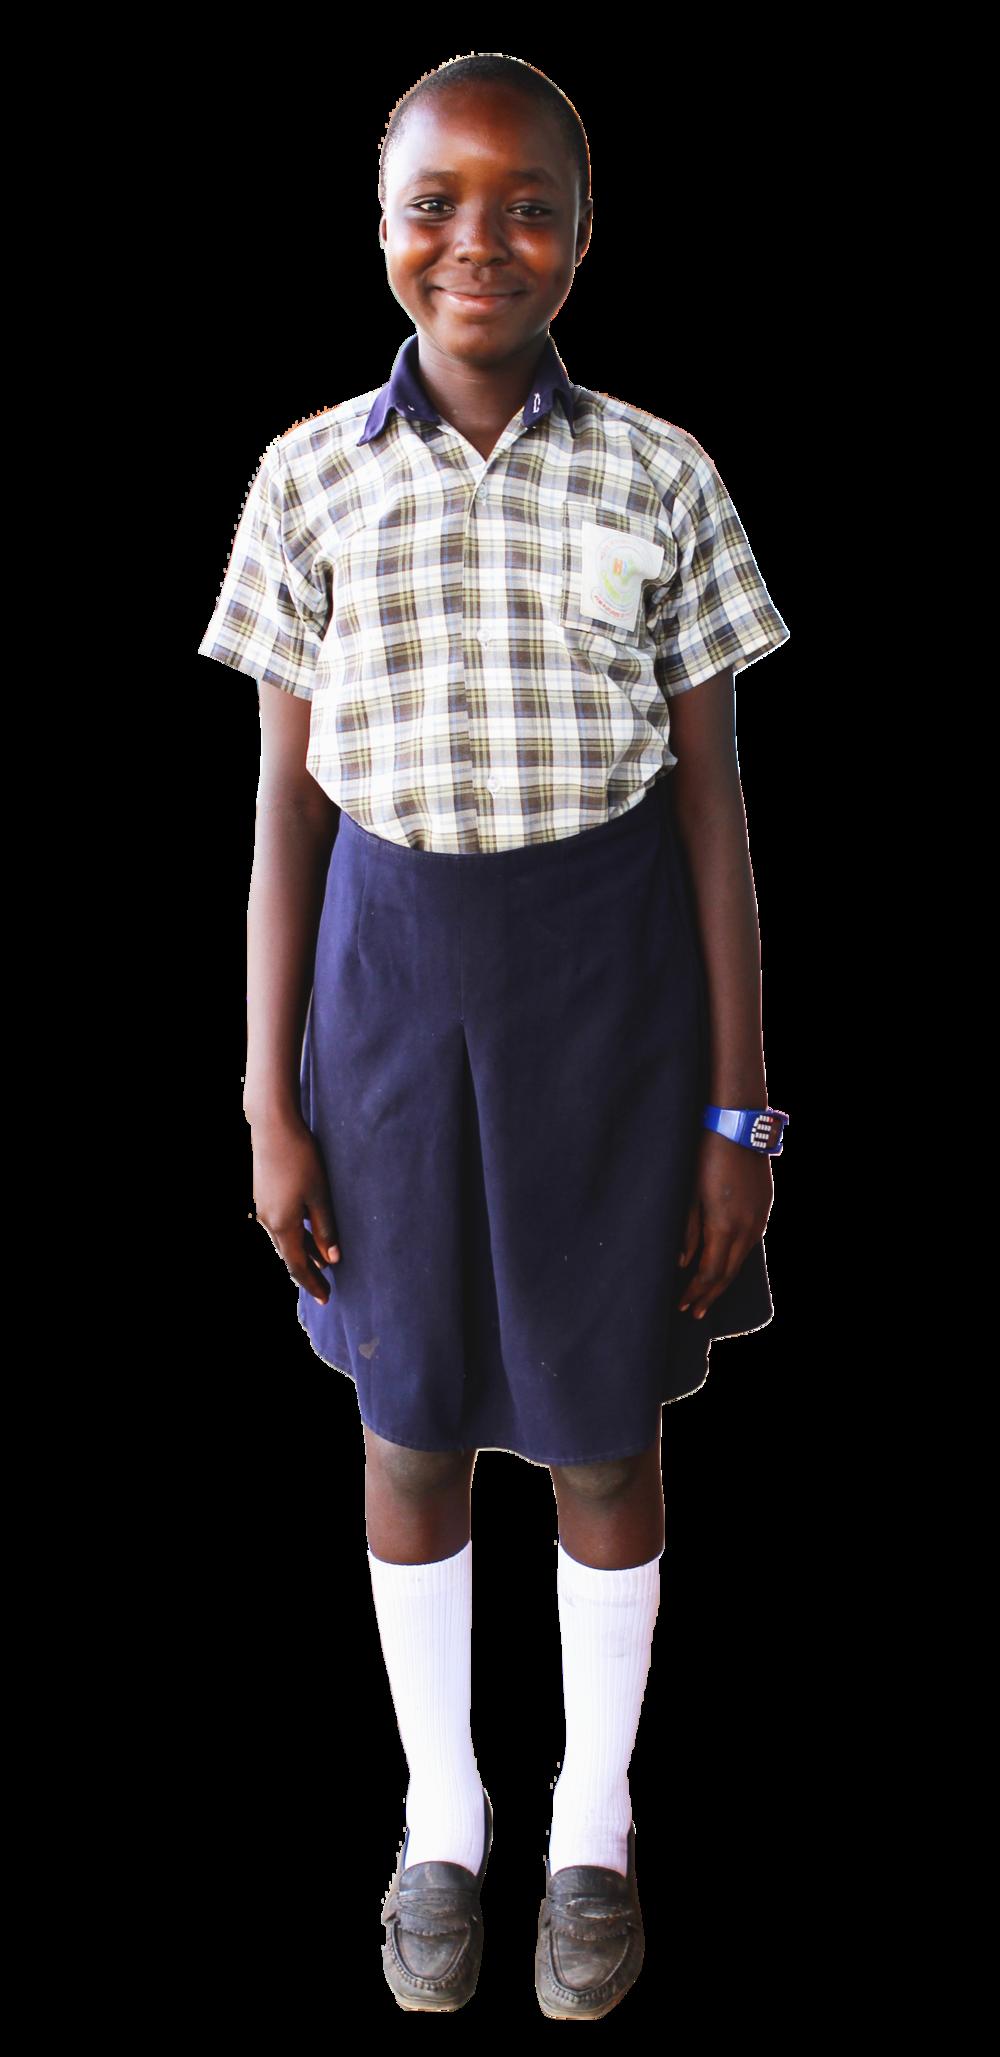 School Uniforms:$22 - Just $22 USD can purchase a student's uniform set. A uniform set includes: formal uniform attire, PE clothes, a sweater, and socks.